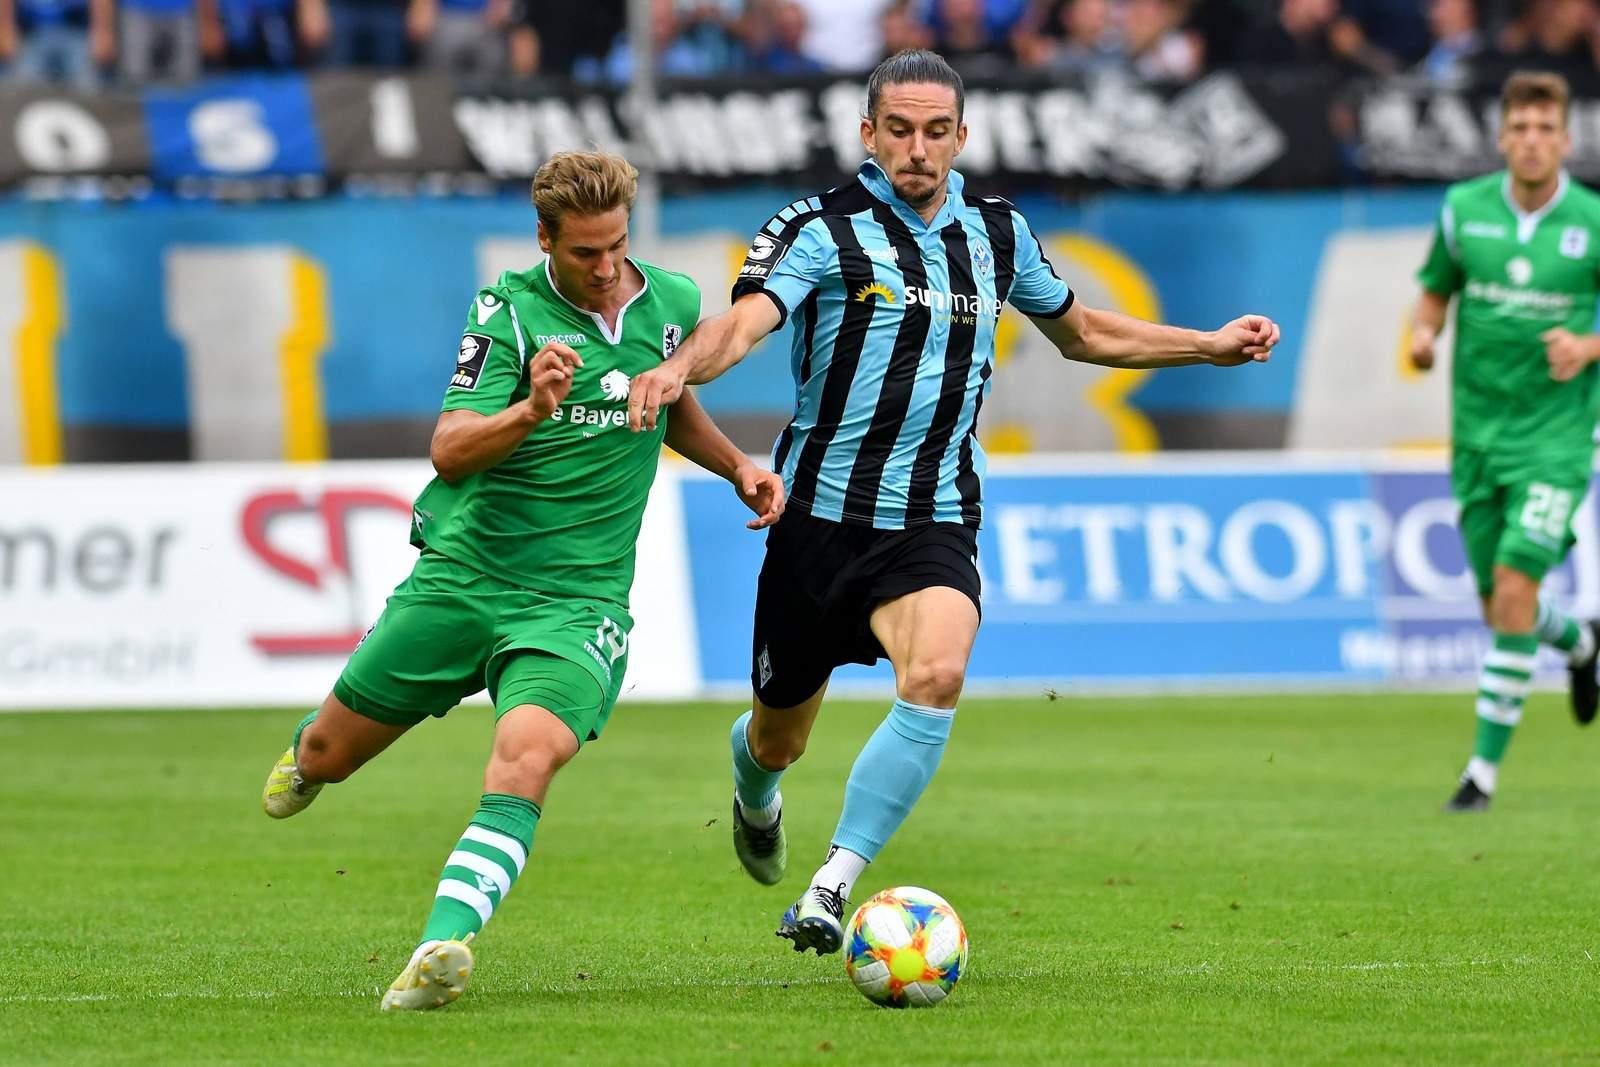 Valmir Sulejmani (r.) behauptet den Ball gegen Münchens Dennis Dressel.